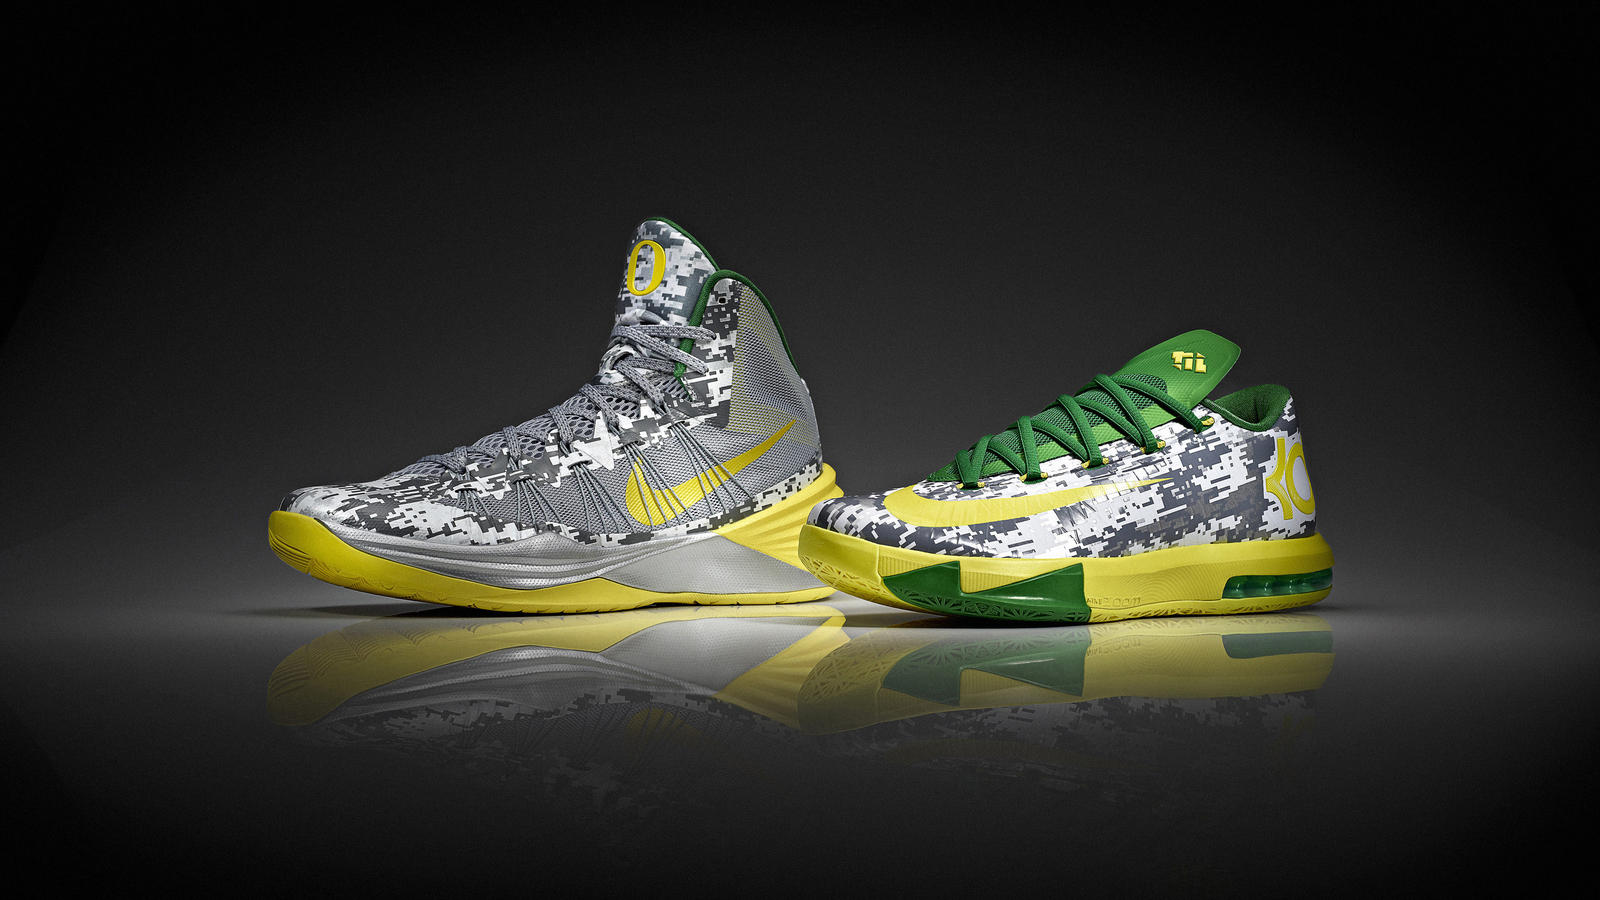 Nike Hyperdunk and KD VI Options for Oregon